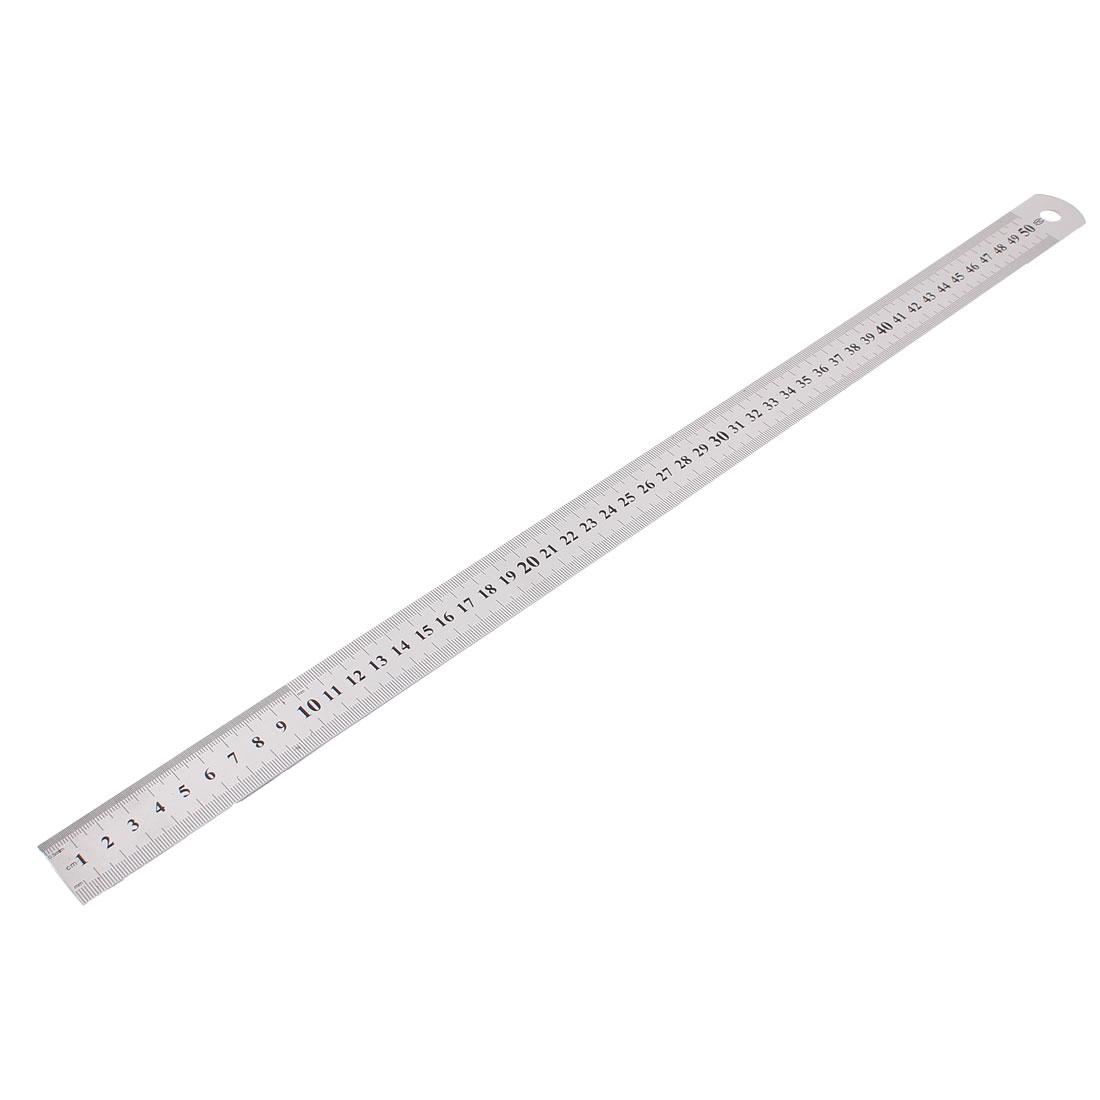 School Stainless Steel Double Sided Metric Ruler Measuring Tool 50cm Range